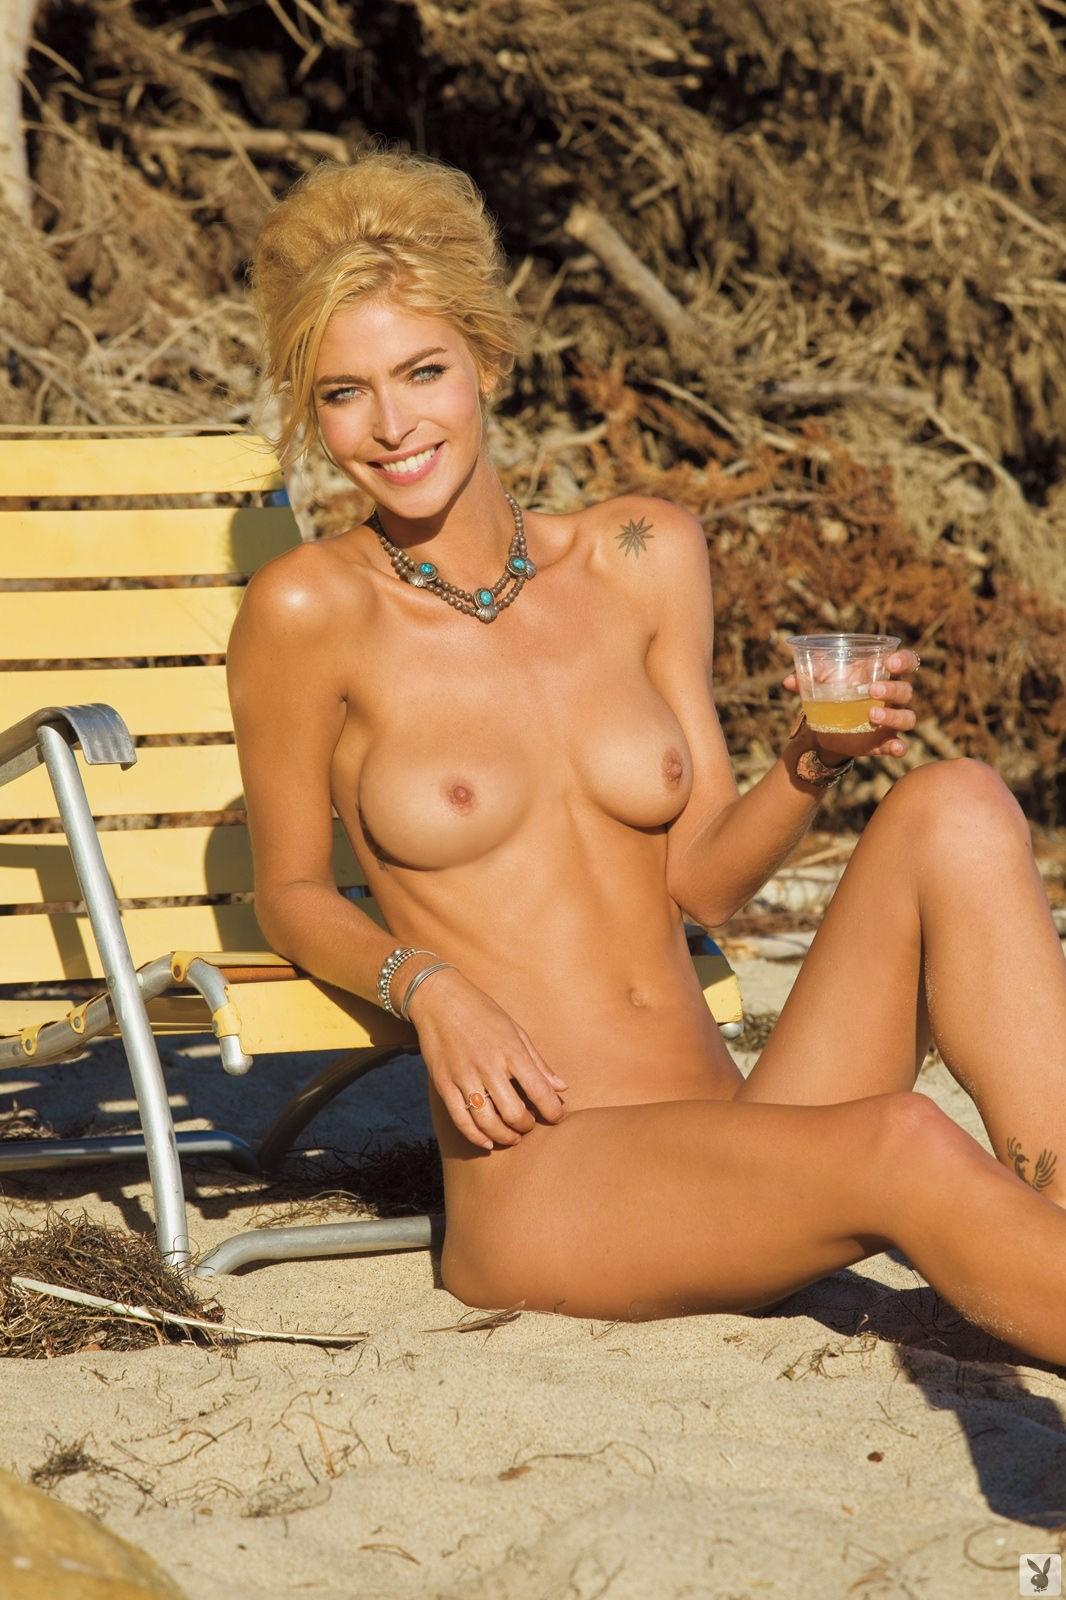 playboy girls nude pic